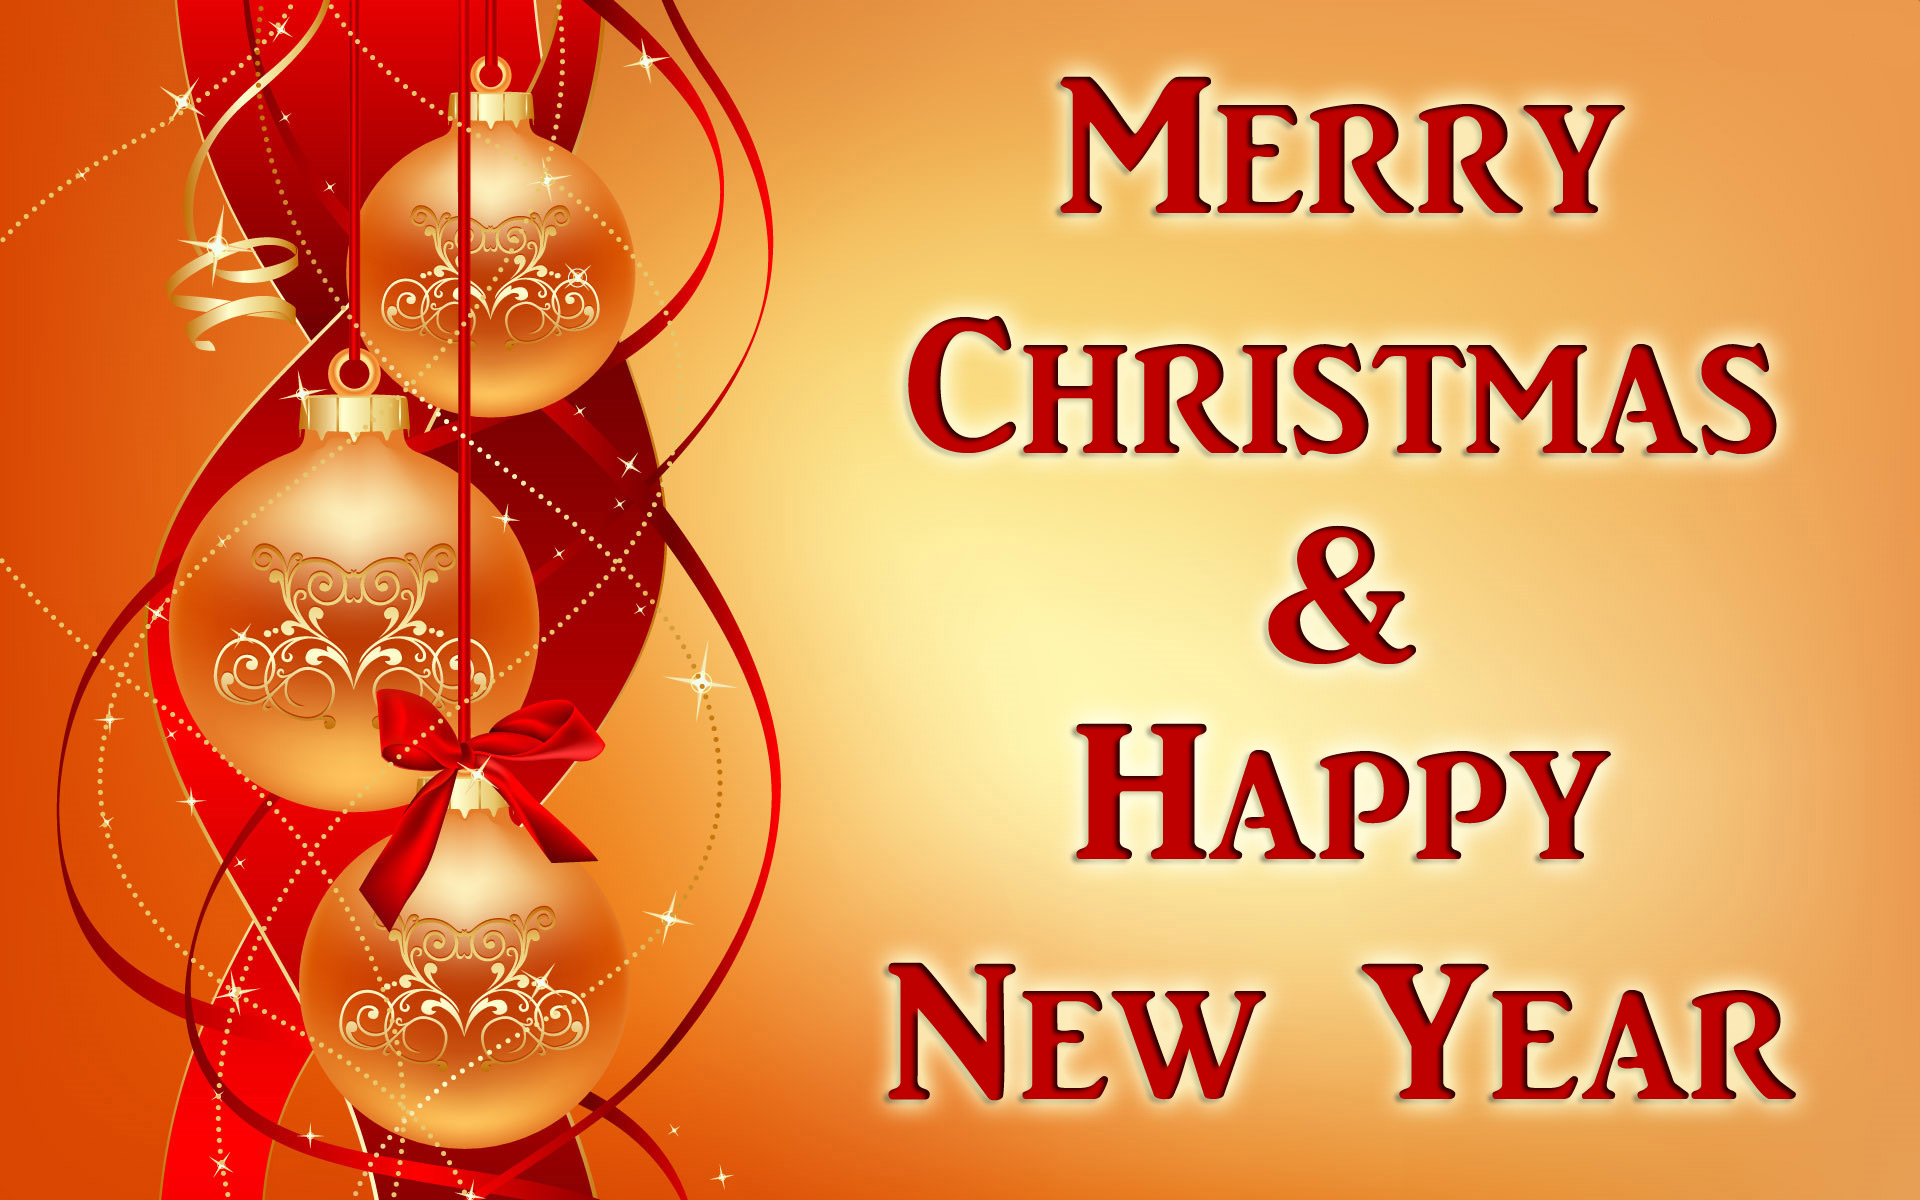 popular-seasonal-luxurious-christmas-card-sayings-grandparents-christmas-card-greetings-girlfriend-christmas-card-greetings-grandparents-christmas-card-sayings-girlfriend-christmas-card-sayings-g